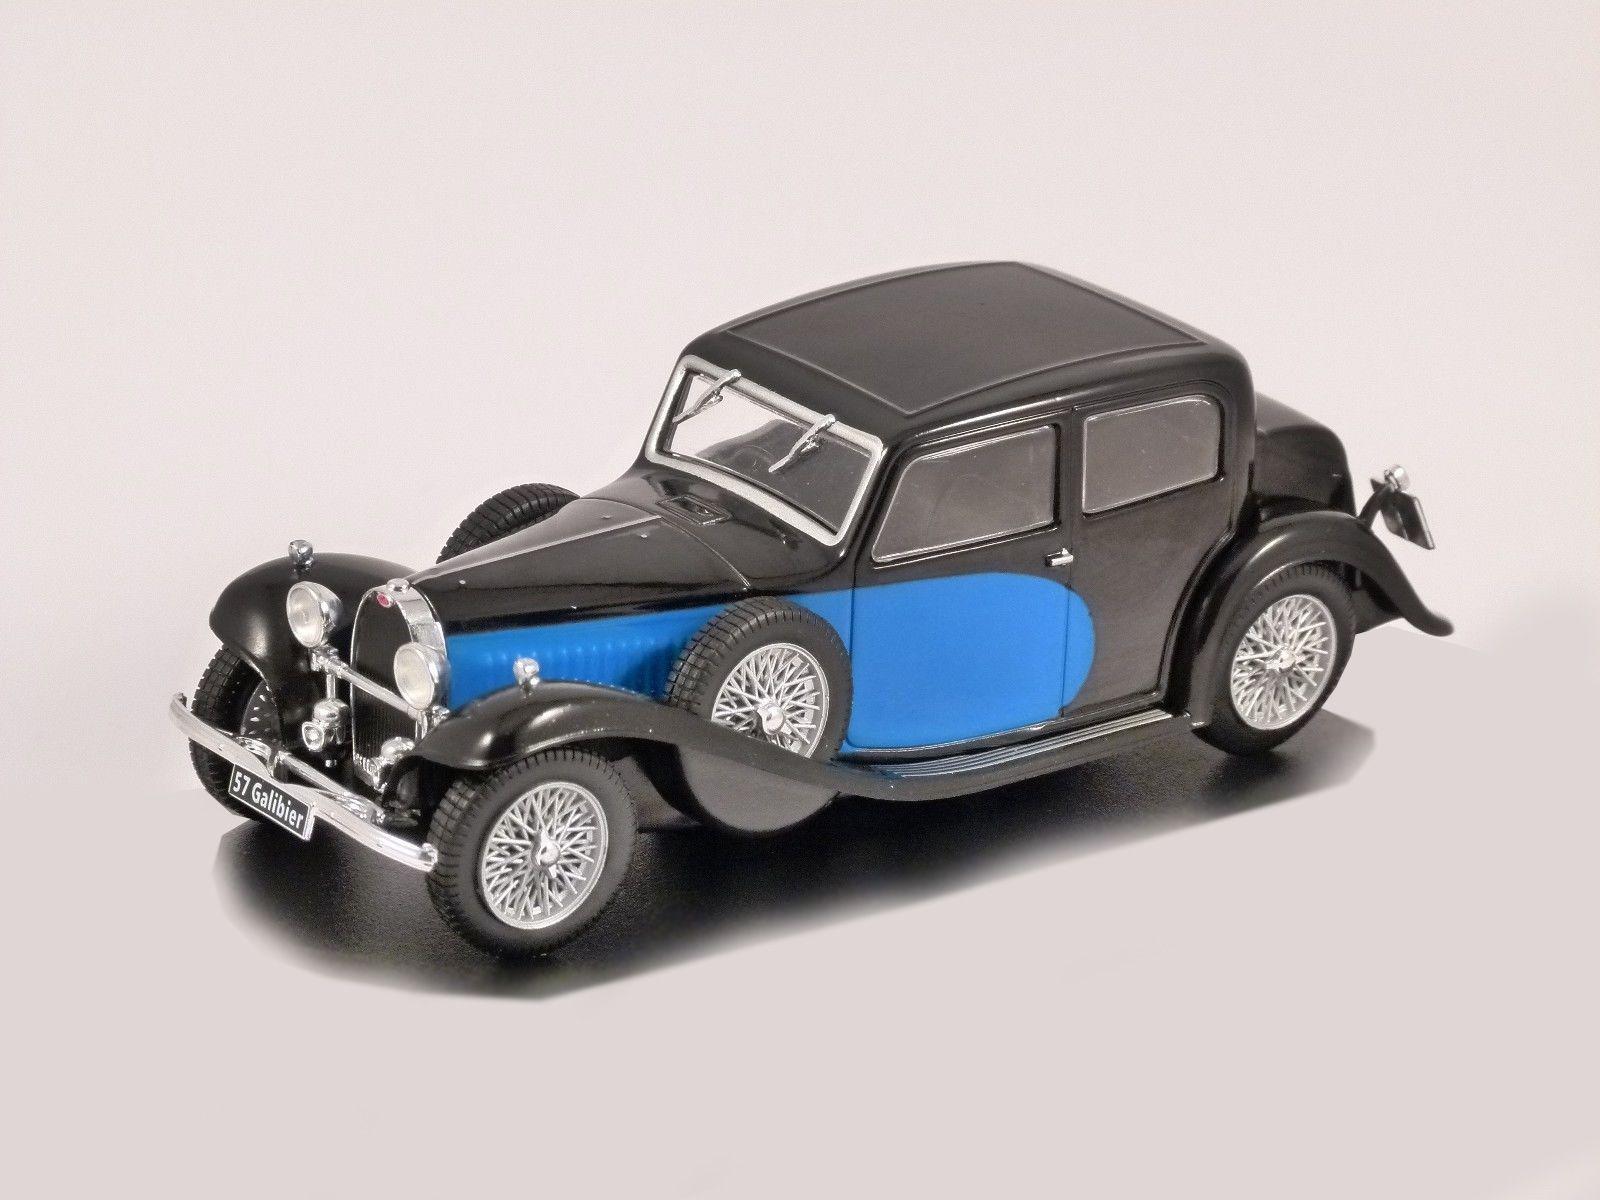 Picture Gallery for Whitebox WHI123 Bugatti Type 57 Galibier (1934)